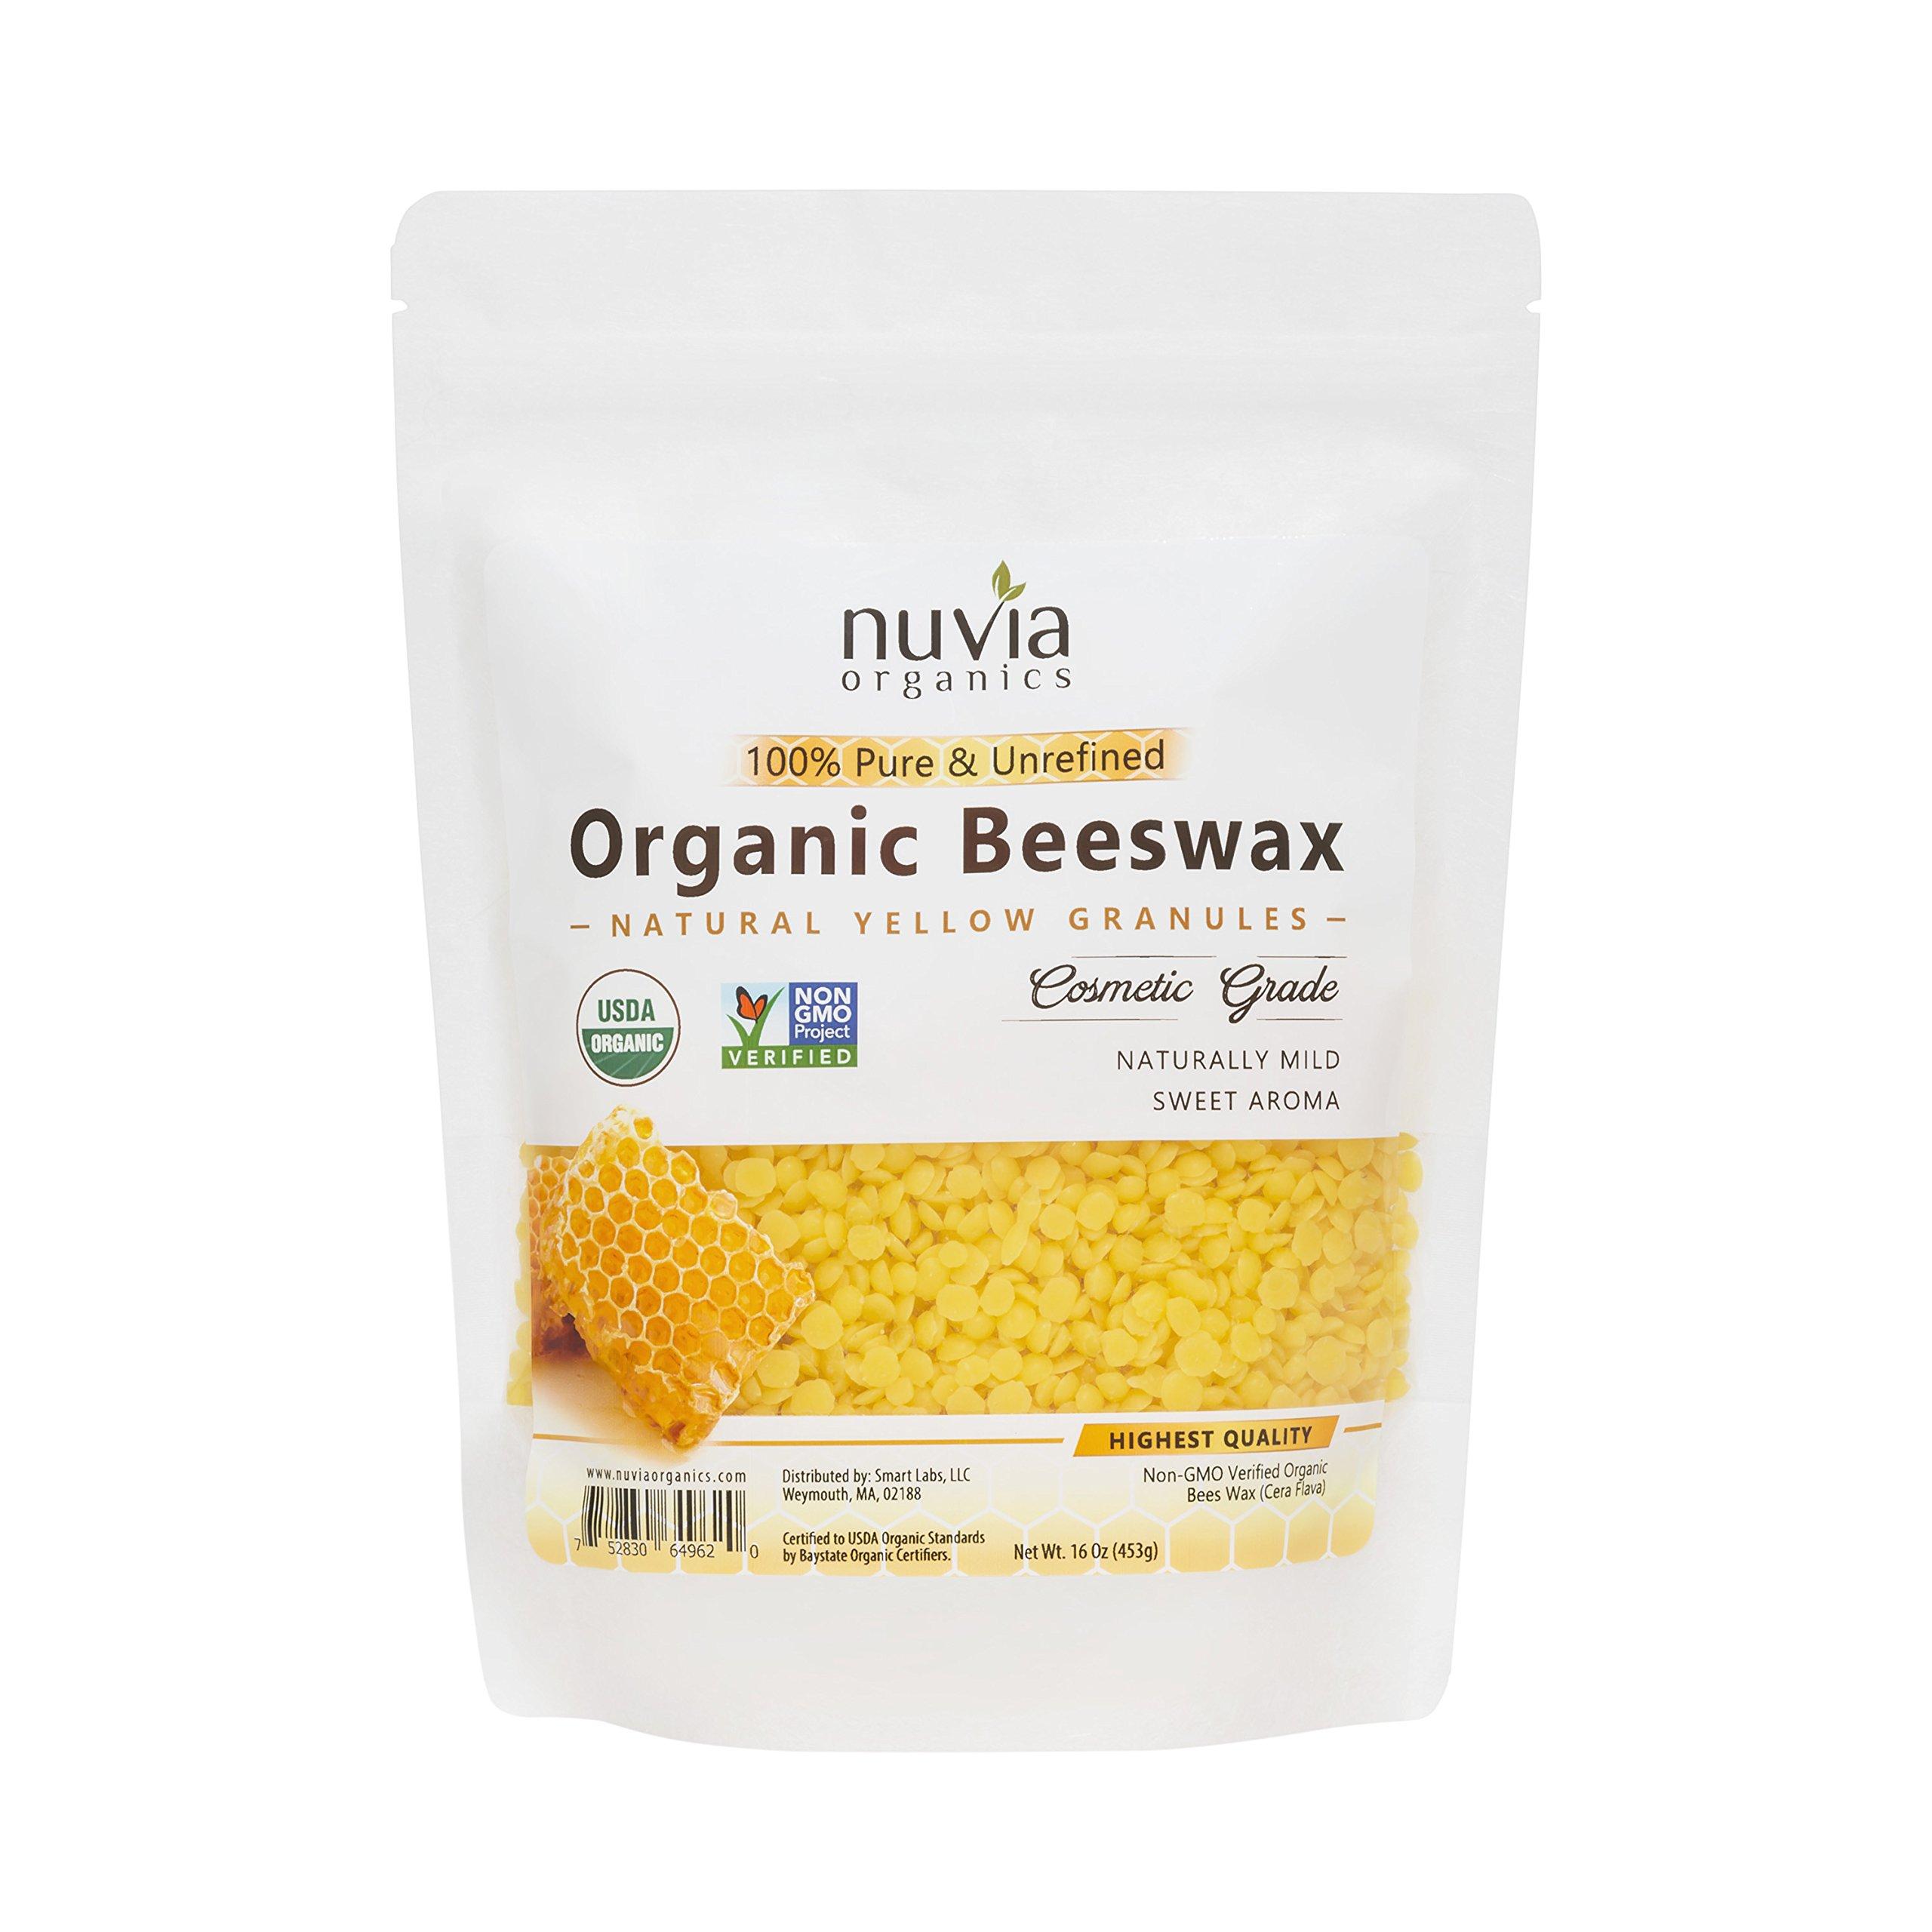 Nuvia Organics Beeswax, USDA Certified & Non-GMO Verified, Natural Yellow Granules, 16oz